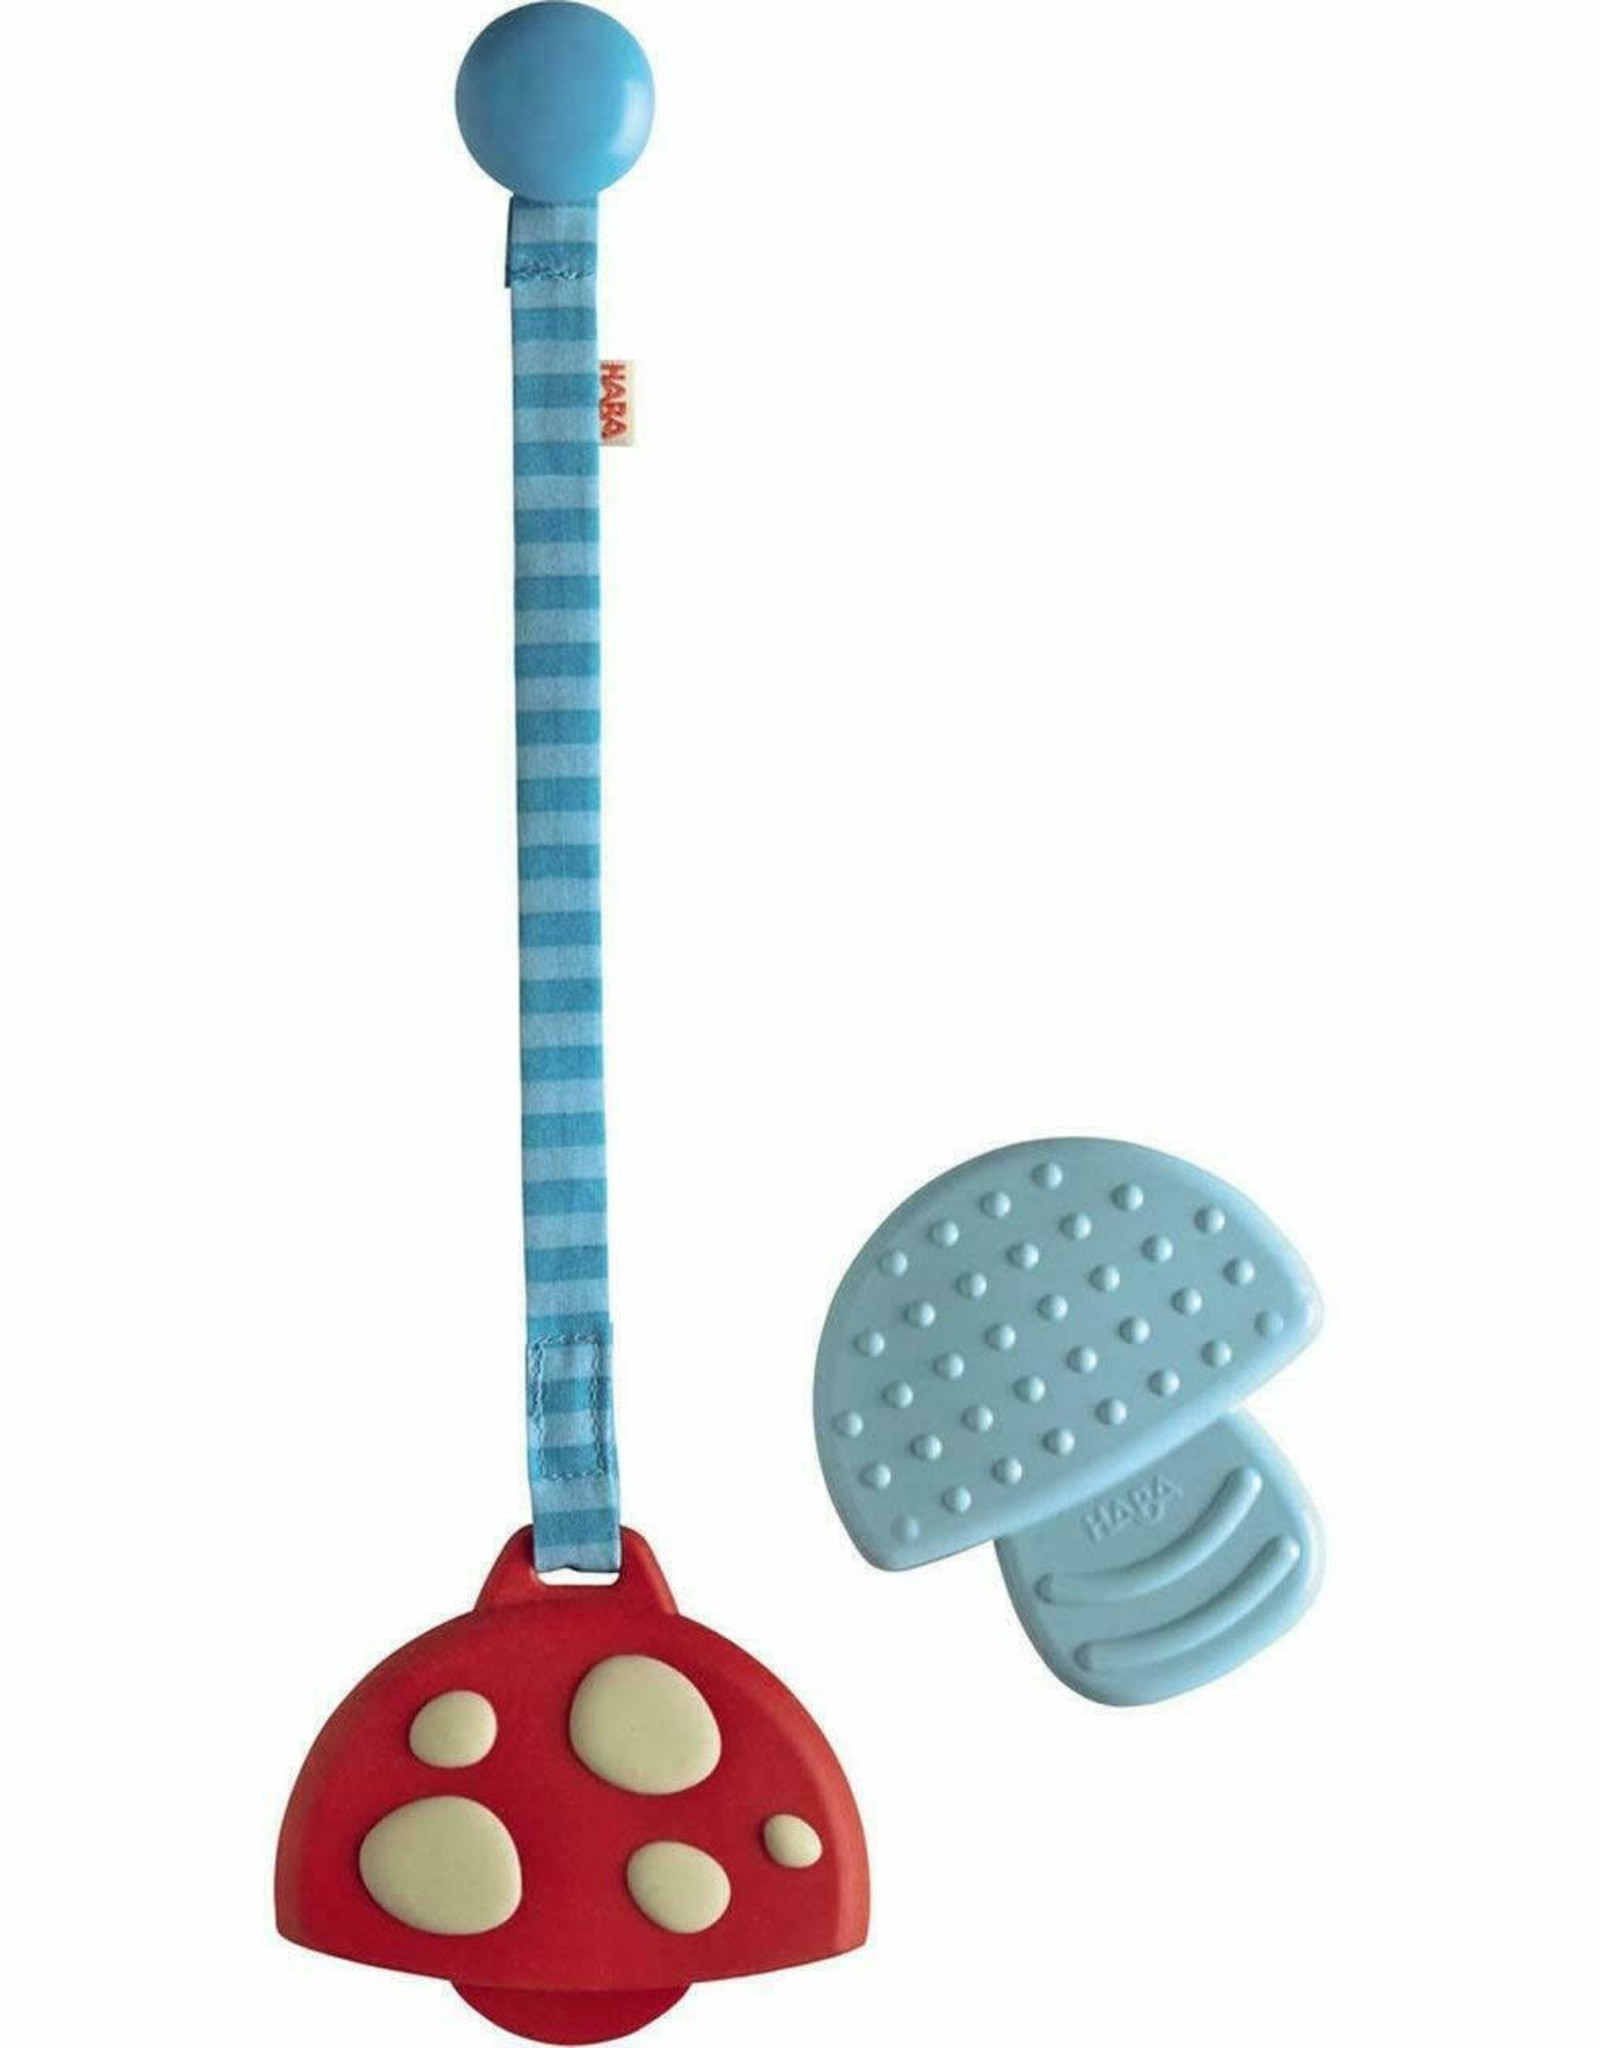 Haba Clutching Mushroom Toy